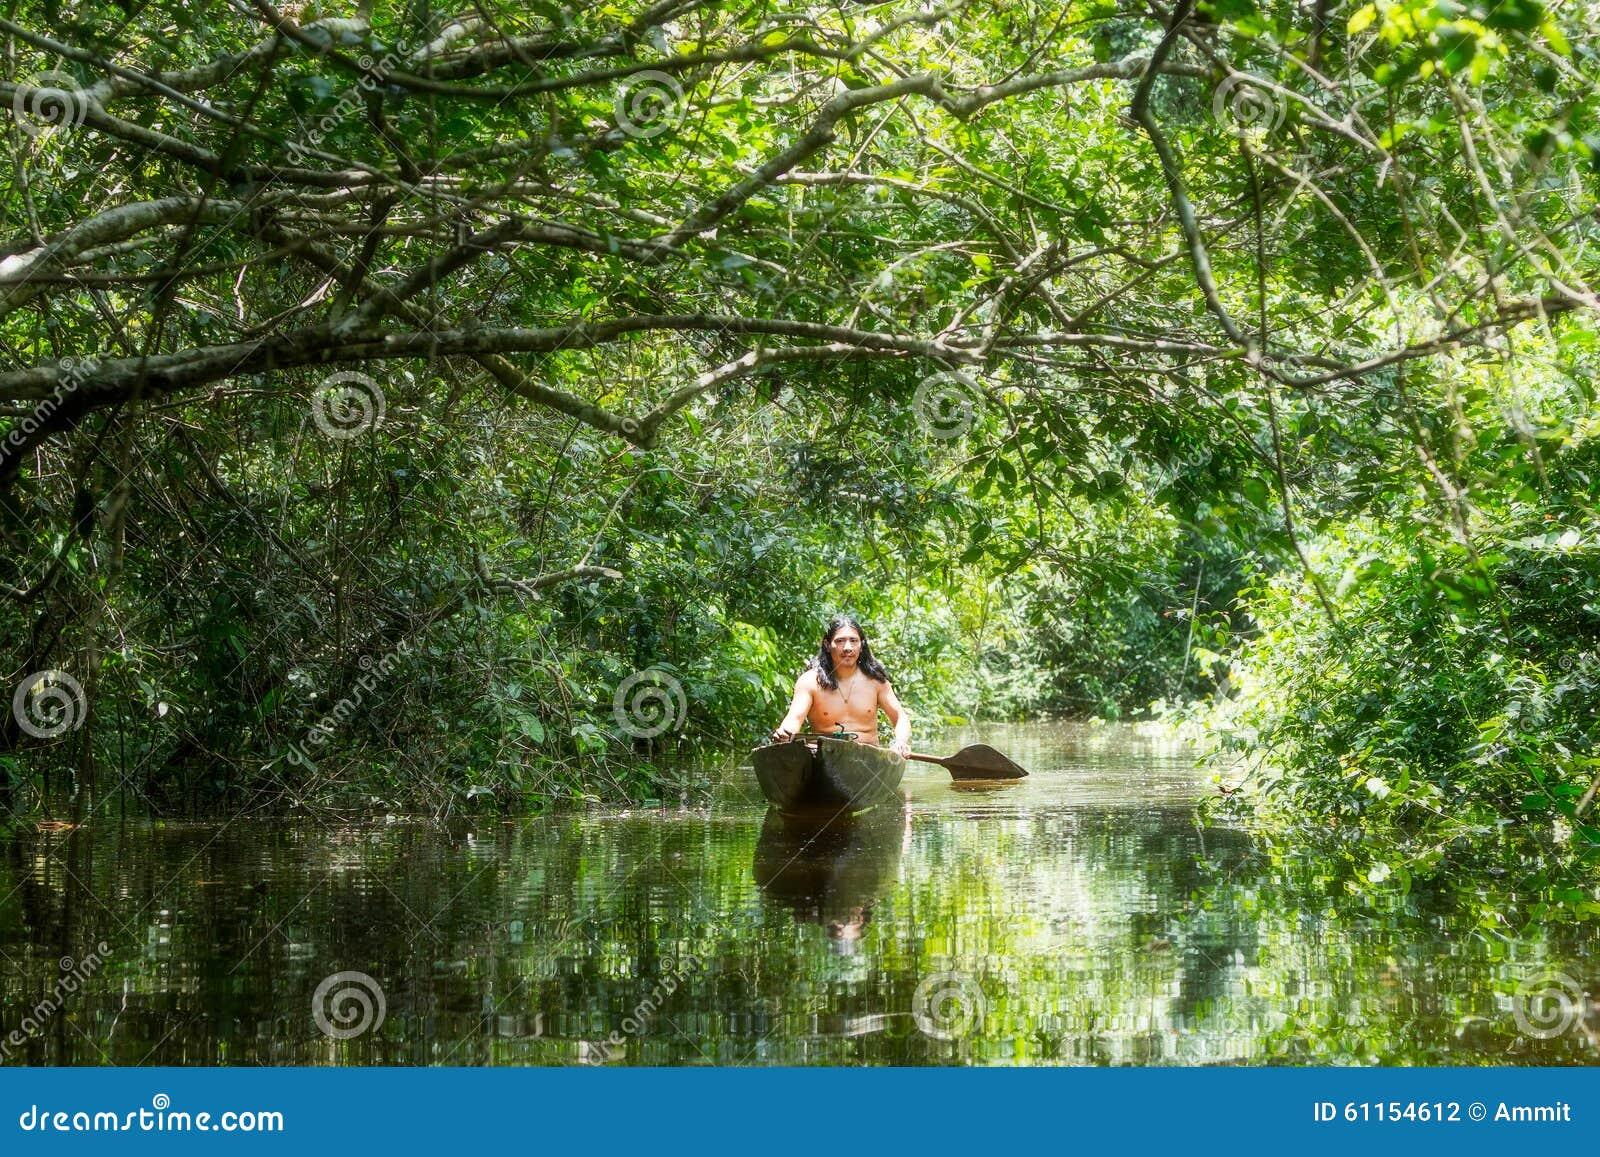 Indigenous Man With Canoe In Amazon Basin